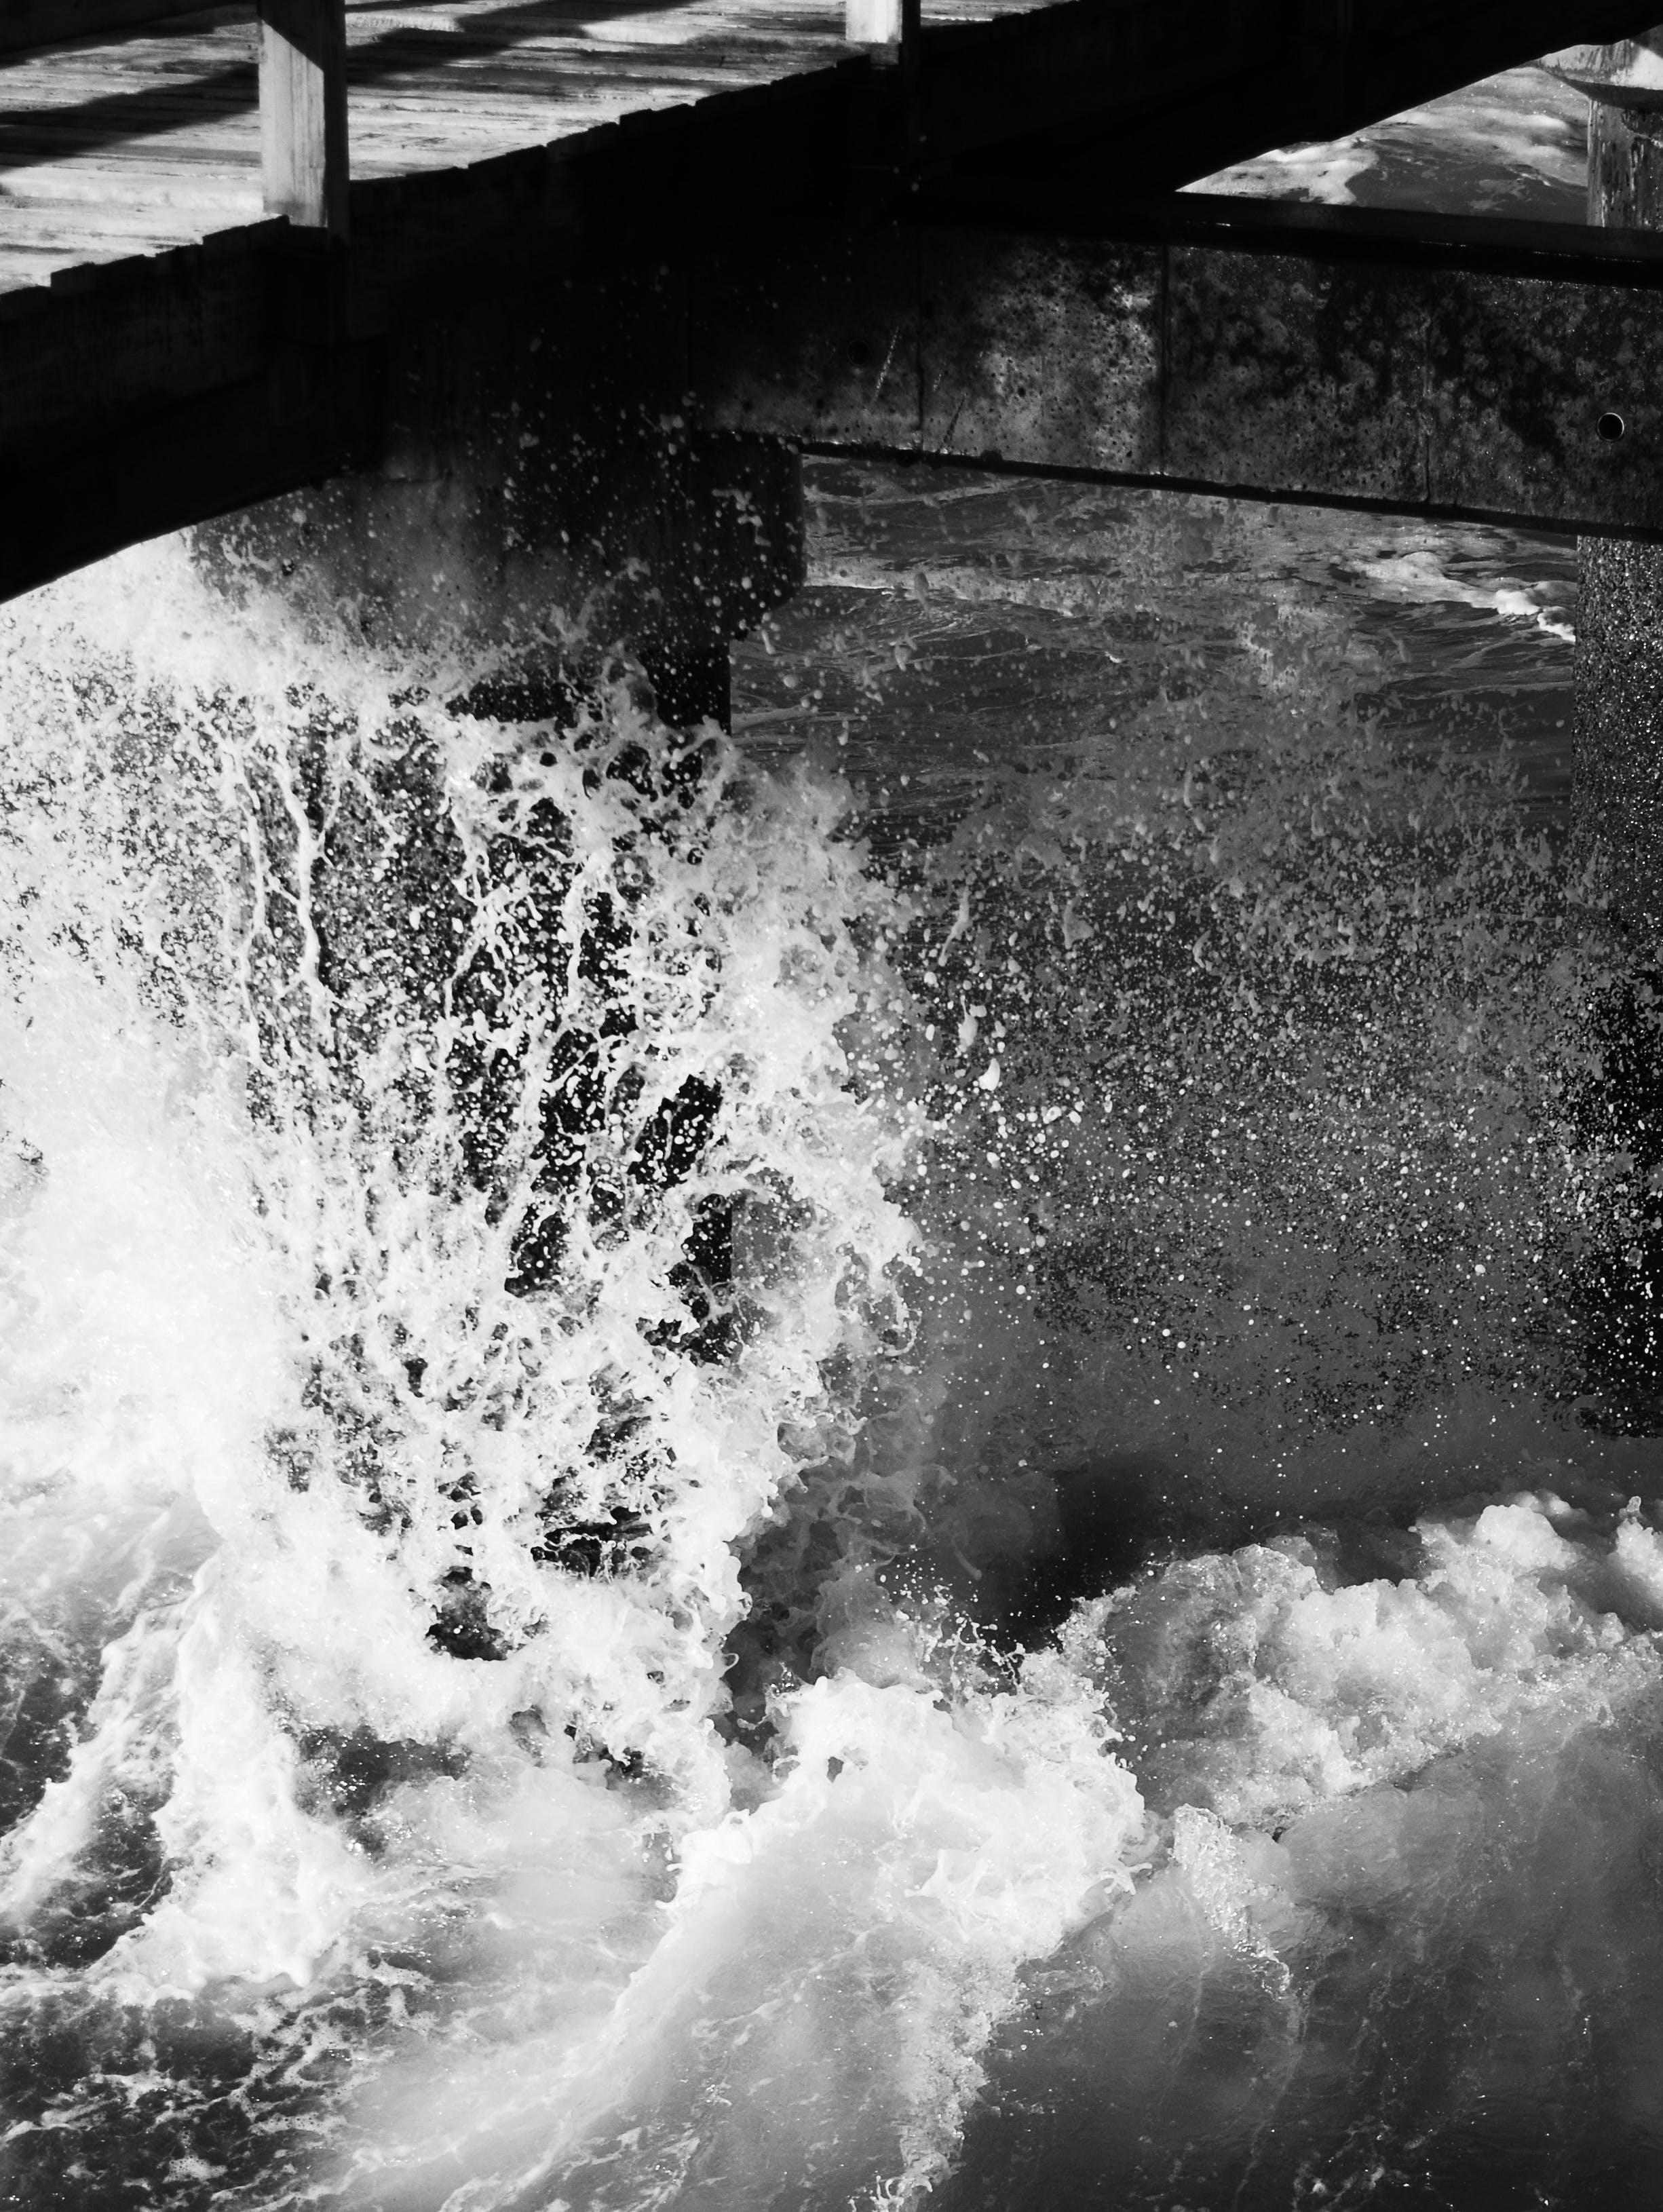 Free stock photo of Jetty Sea Water Tide Break Black White